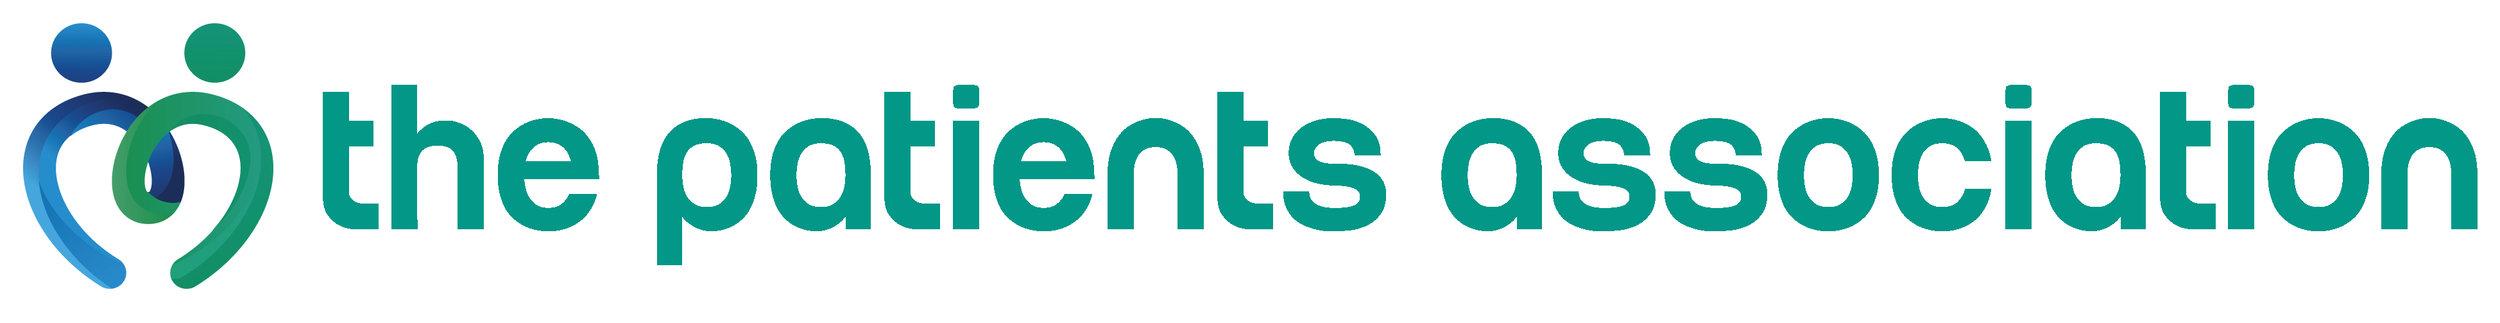 The Patients Association Logo.jpg